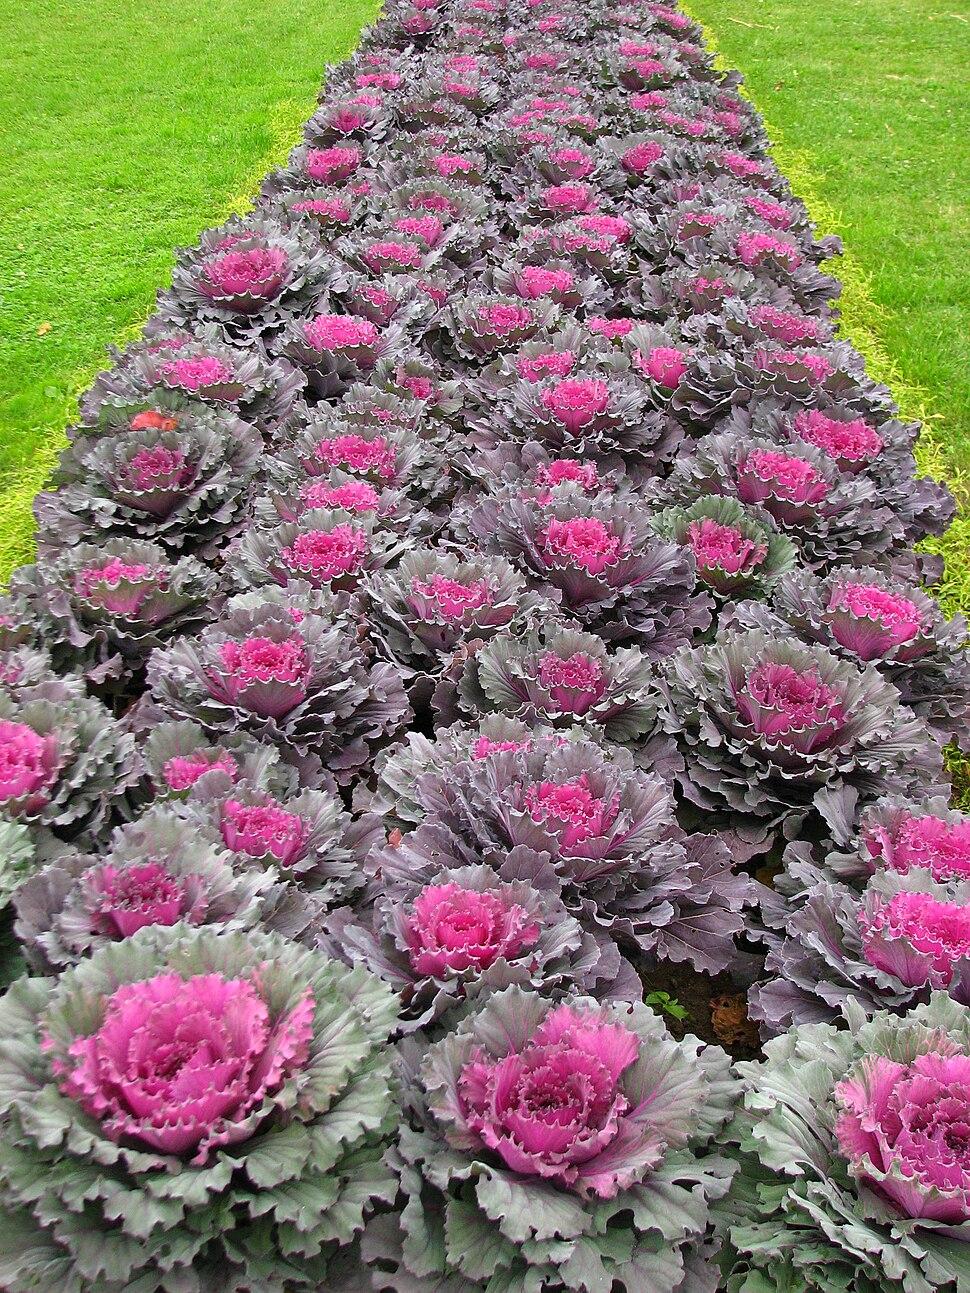 Brassica in a flowerbed 01